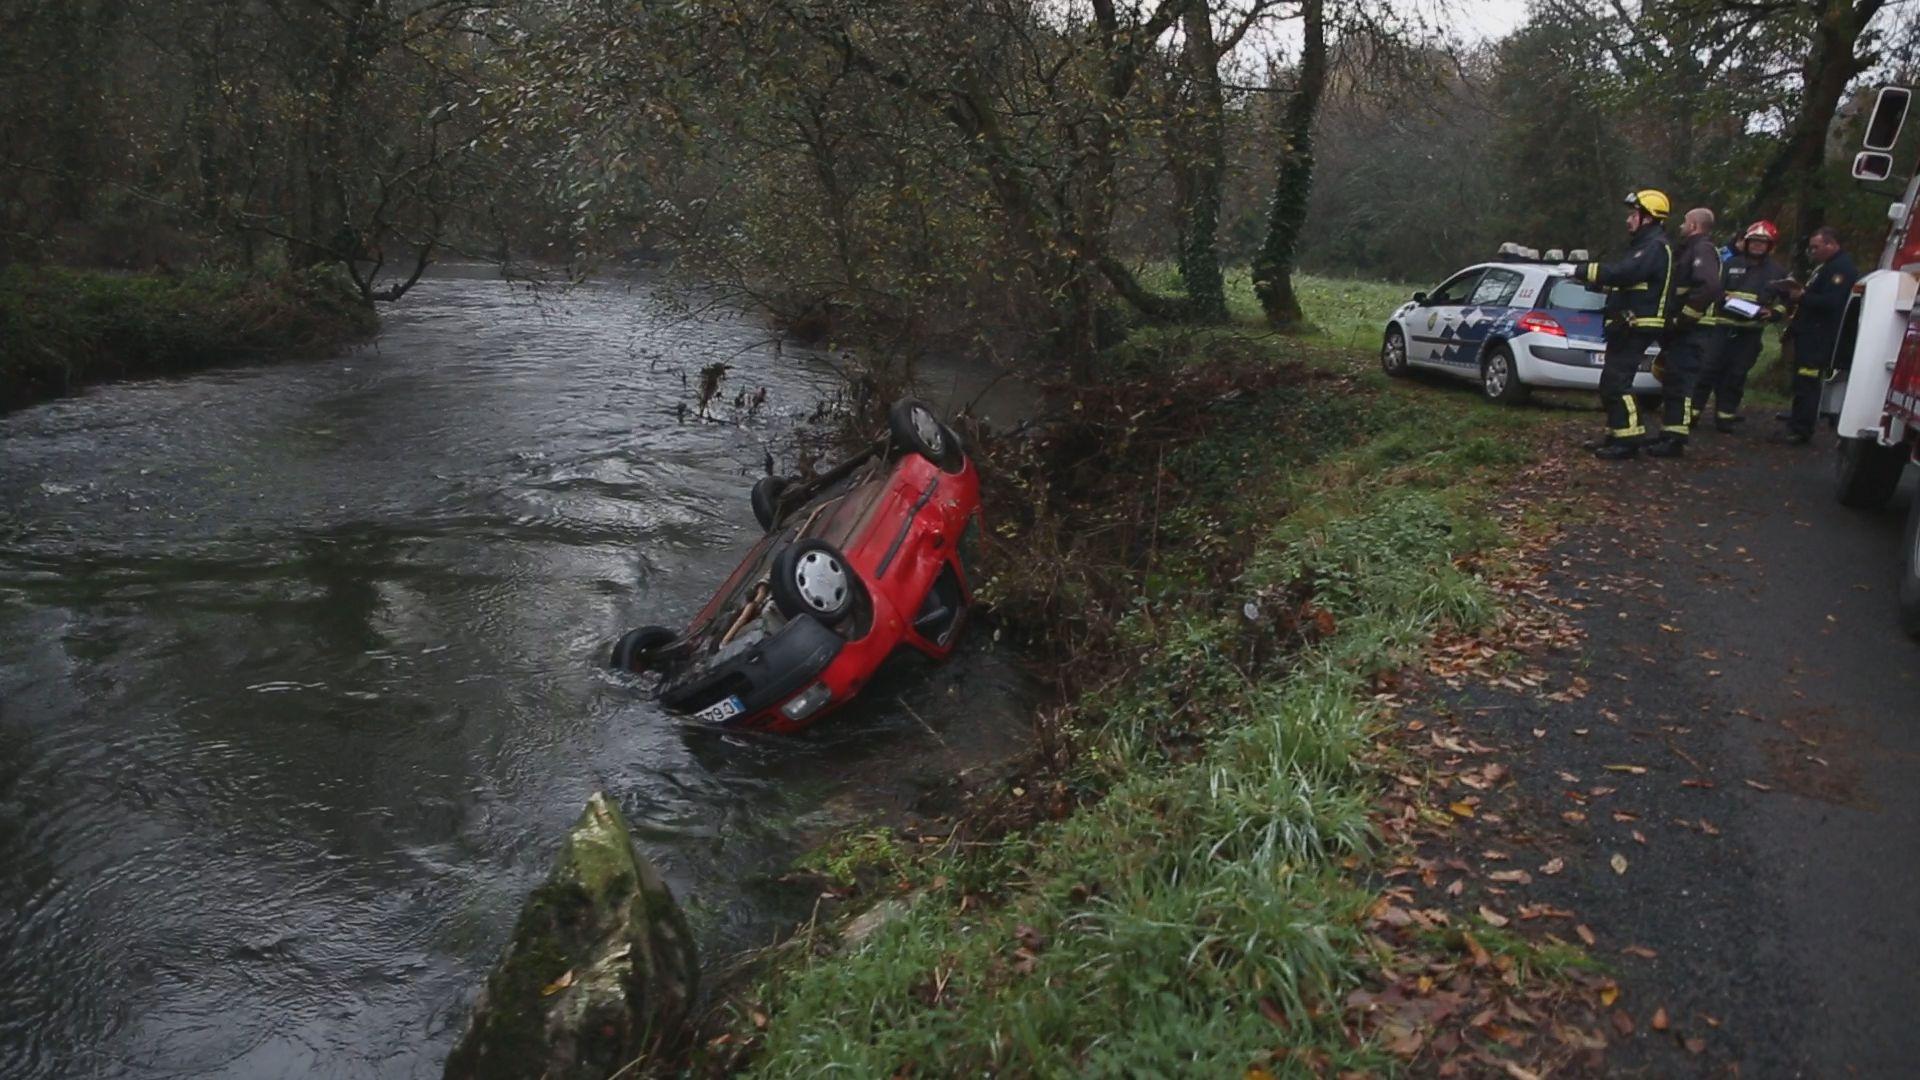 Una mujer se precipita con su coche al río Anllóns